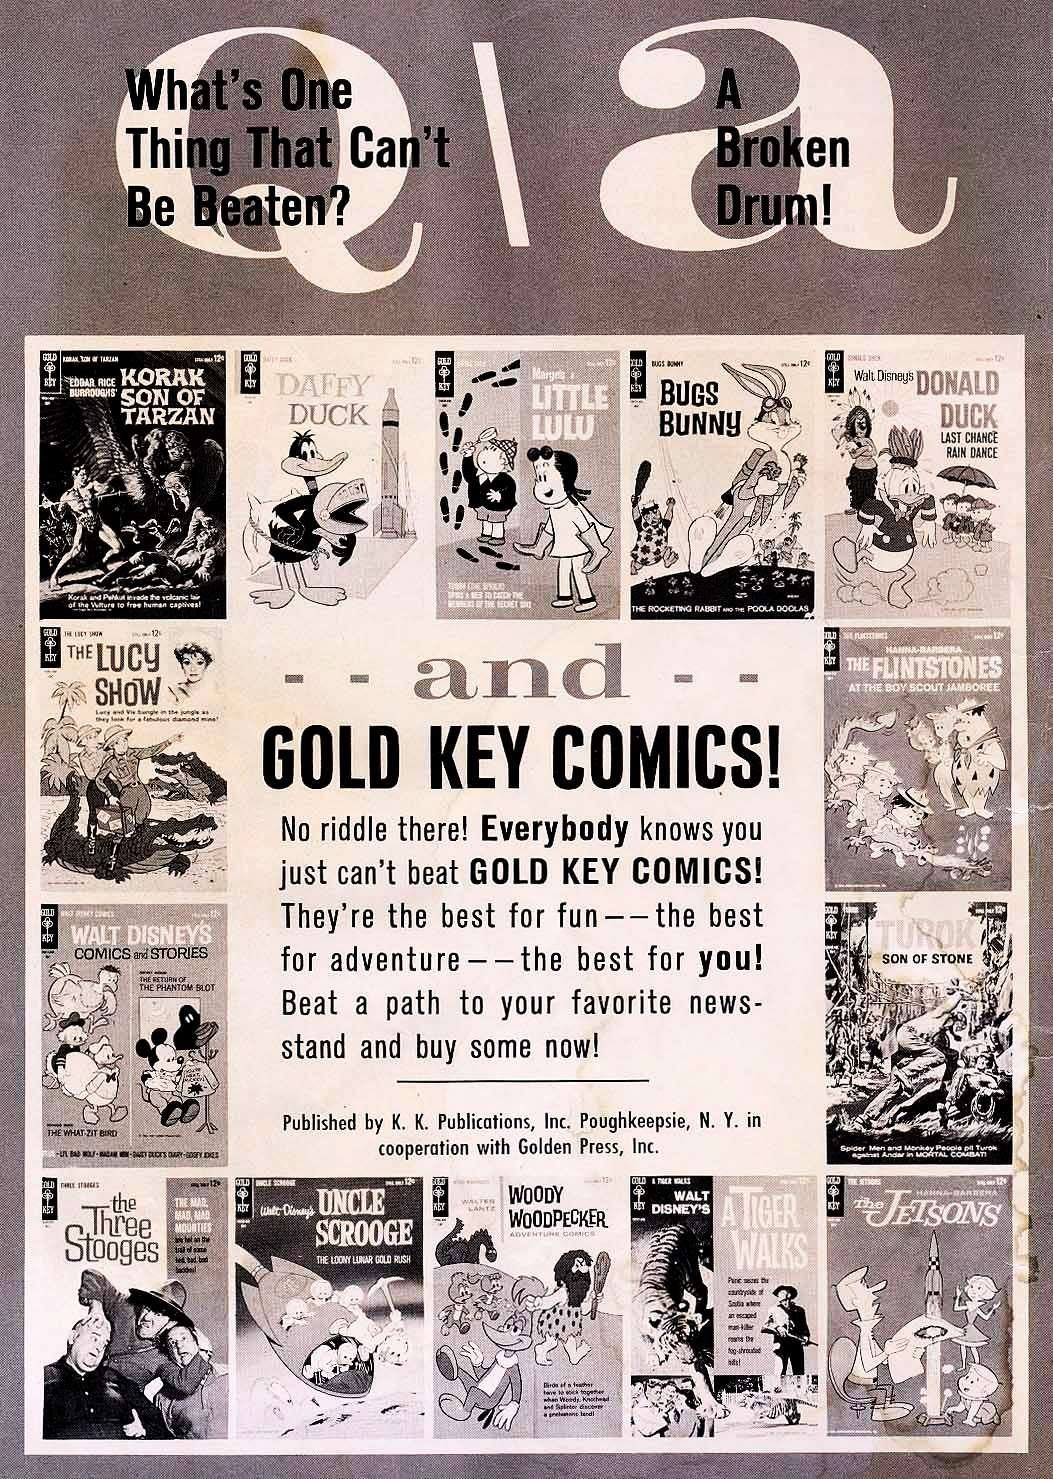 Anzeige in Tarzan (Gold Key) # 142